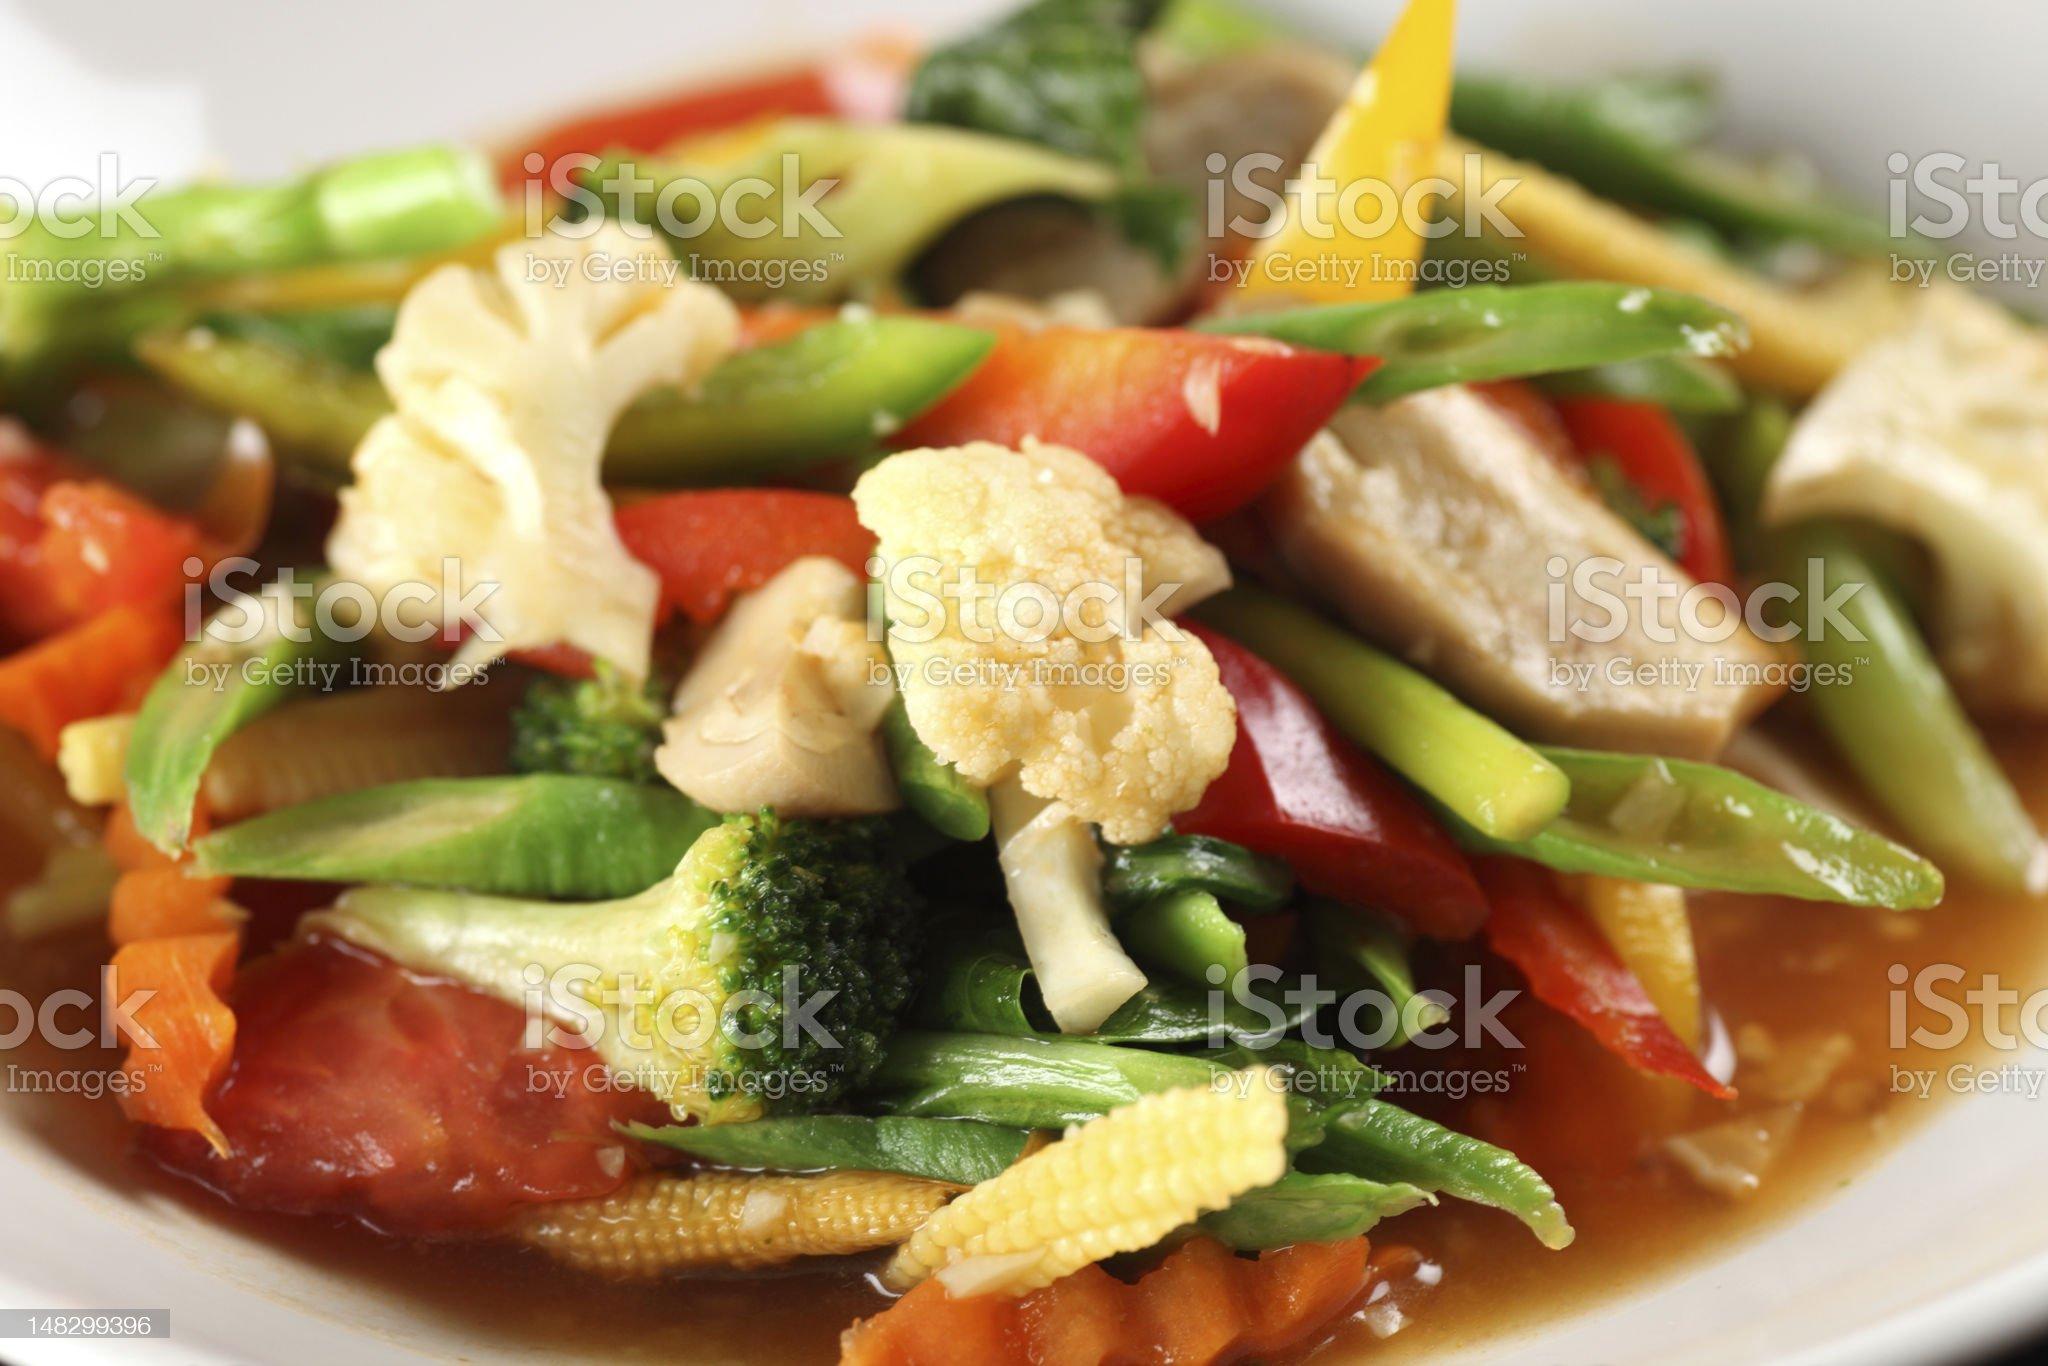 Stir Fried Vegetables royalty-free stock photo